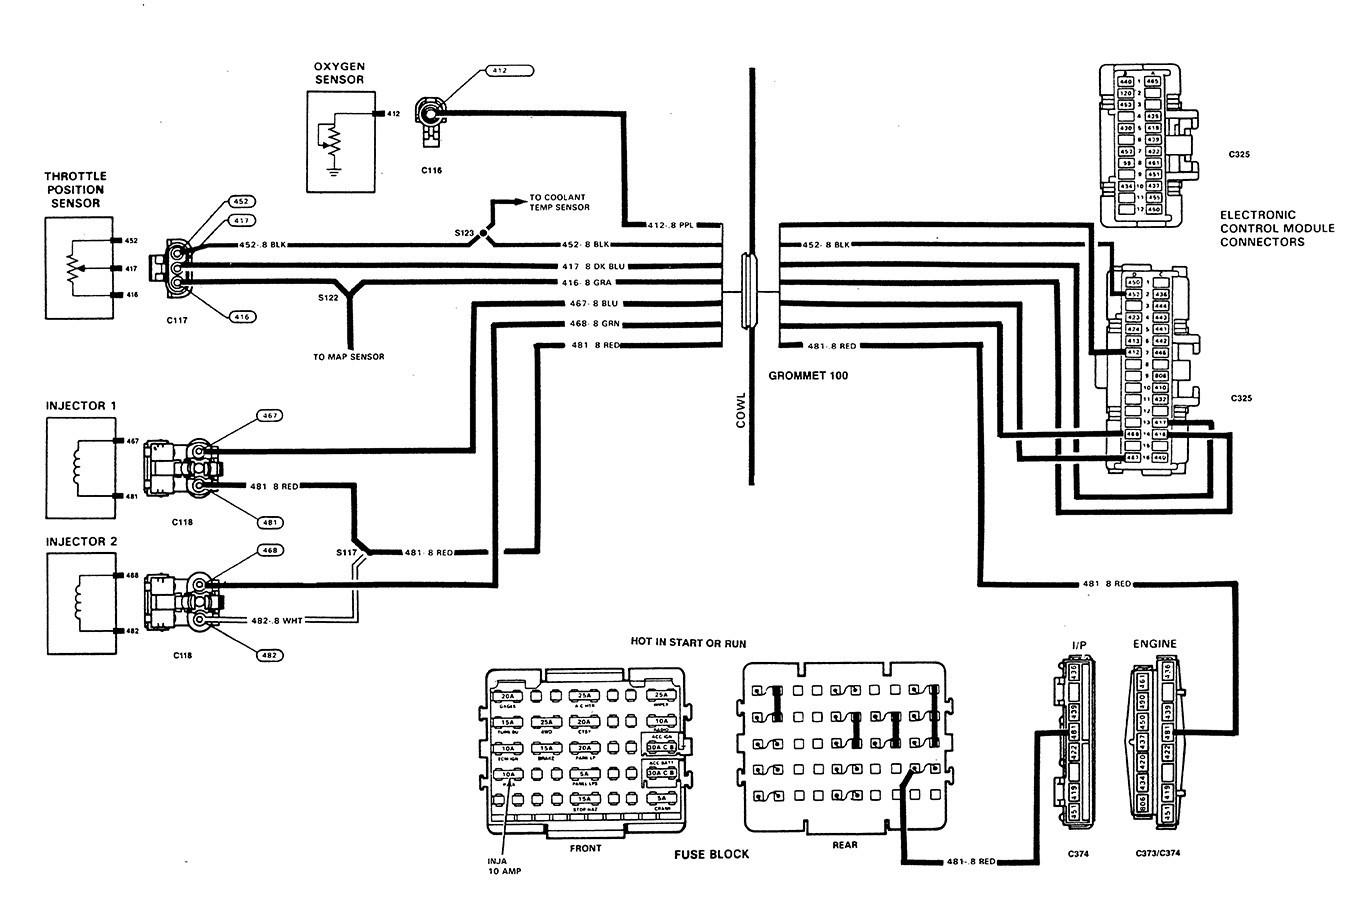 Jeep Grand Cherokee O2 Sensor Wiring Diagram